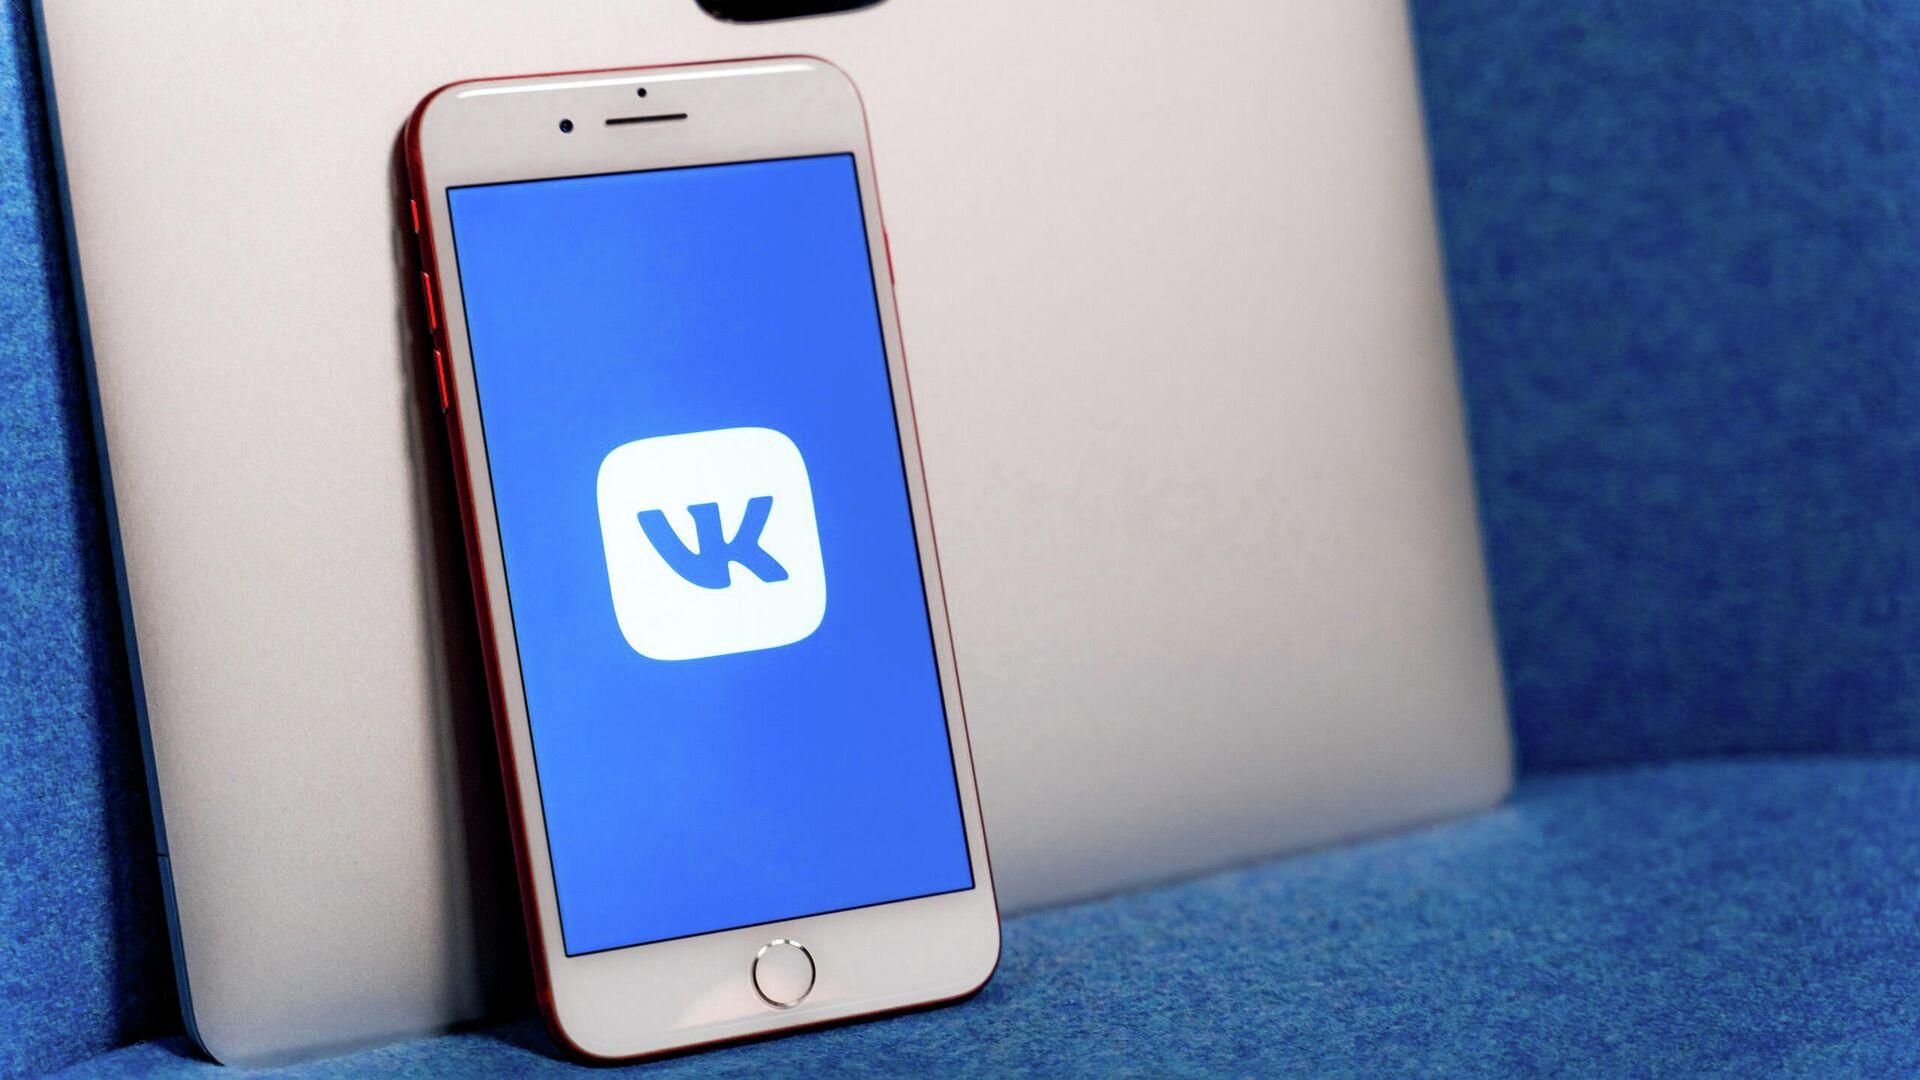 Логотип ВКонтакте на экране смартфона - РИА Новости, 1920, 22.01.2021